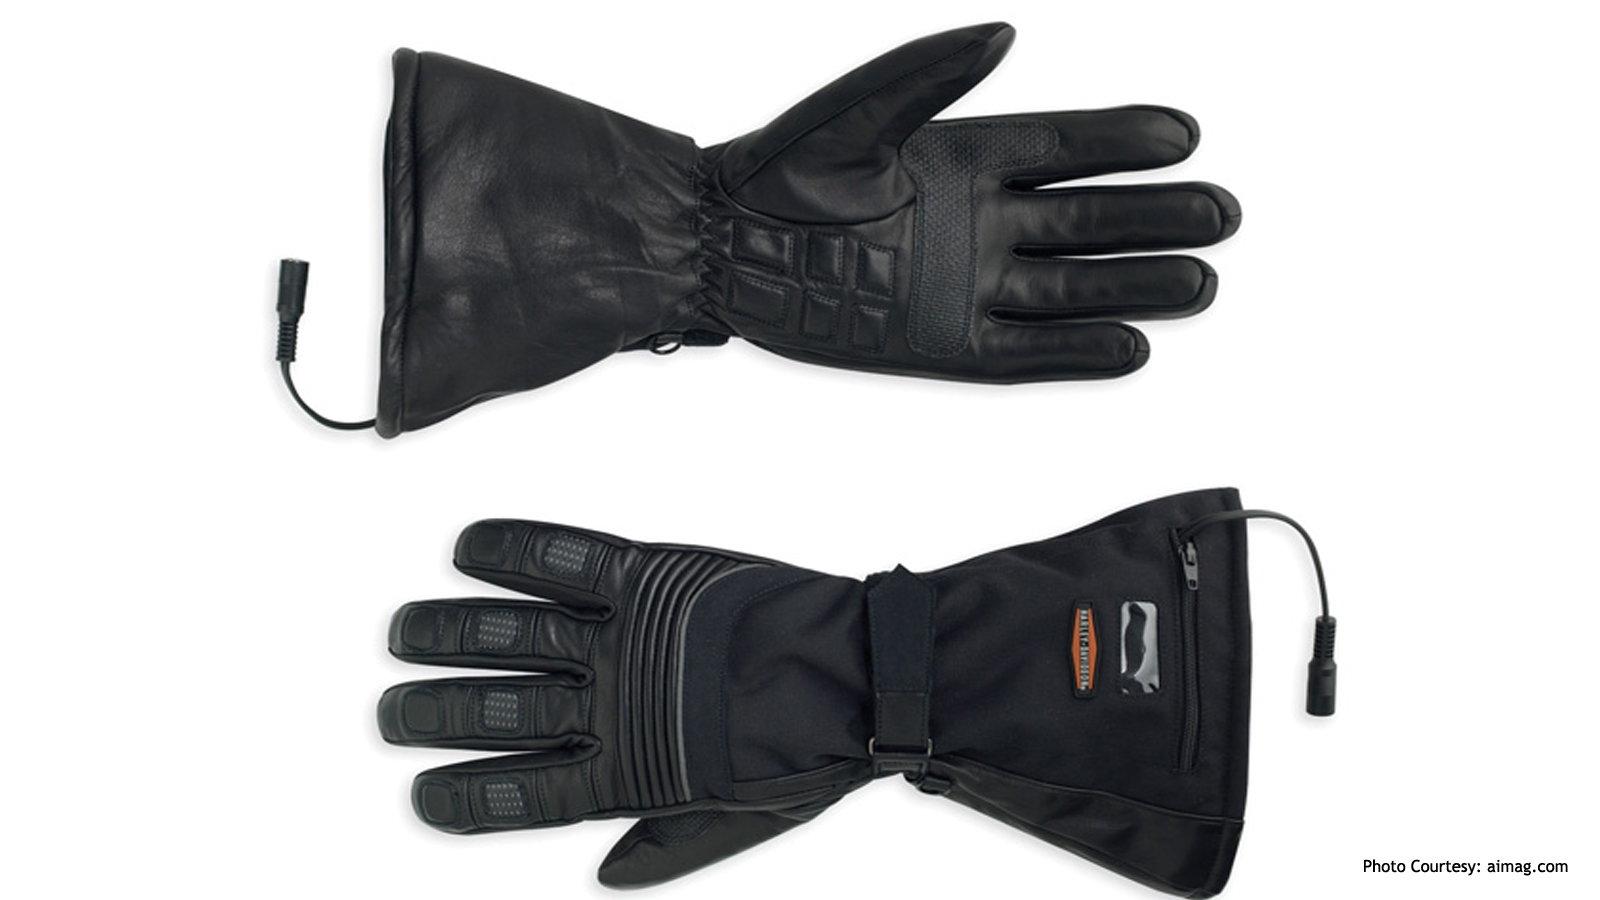 Harley Davidson Heated Gloves